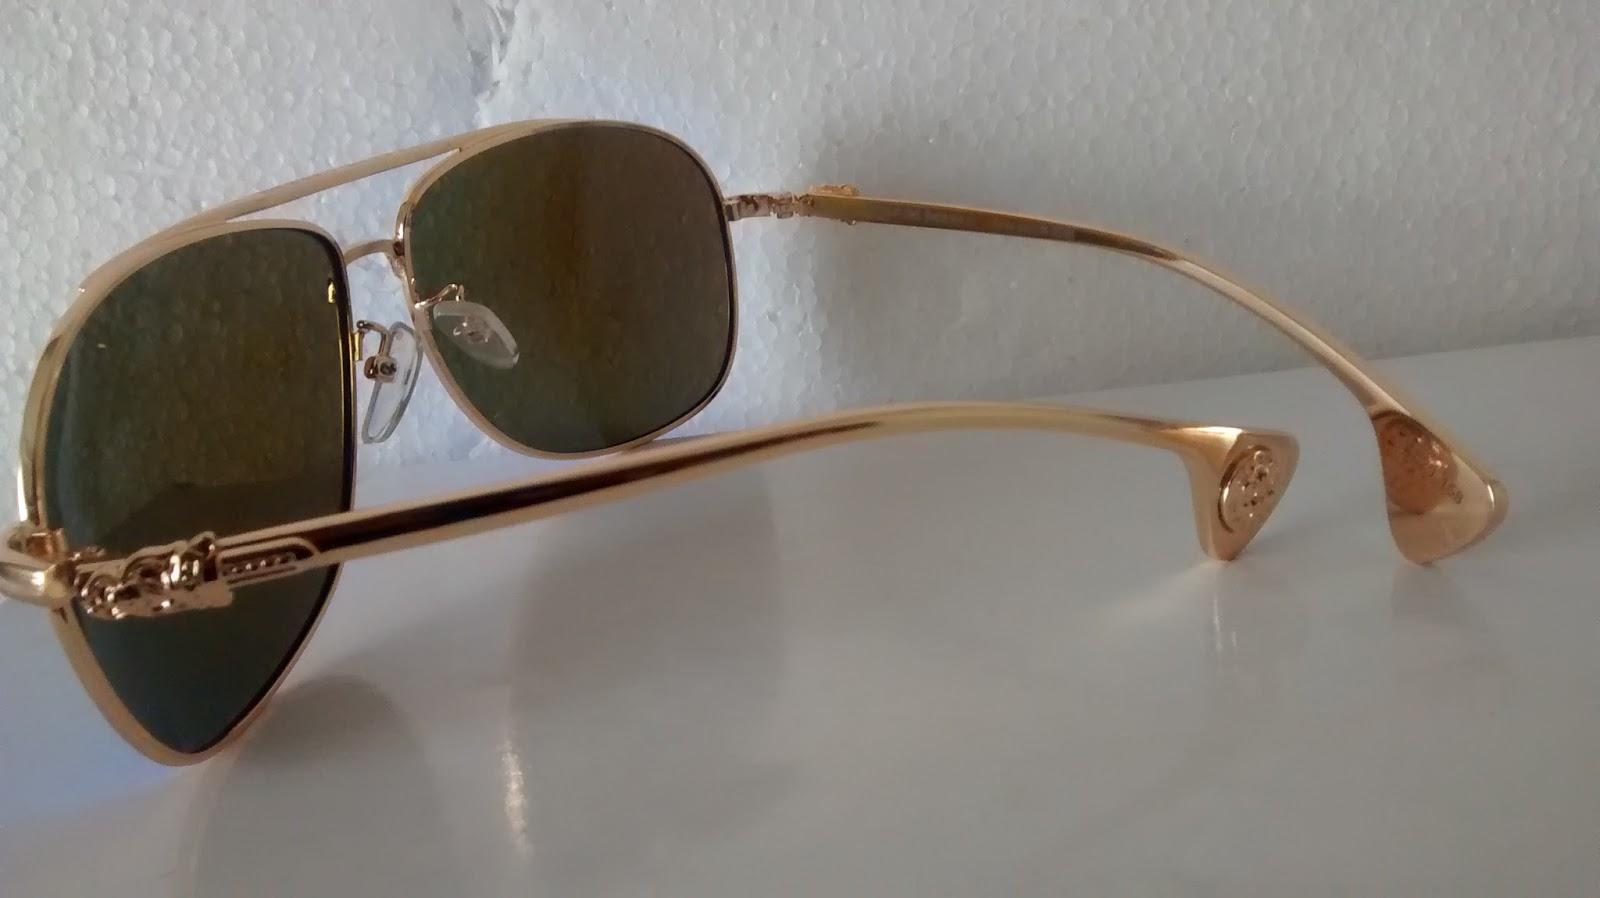 a5b4da7f750 Rs1999 Chrome Hearts Sunglasses Mirror Blue Gold Frame Size 62